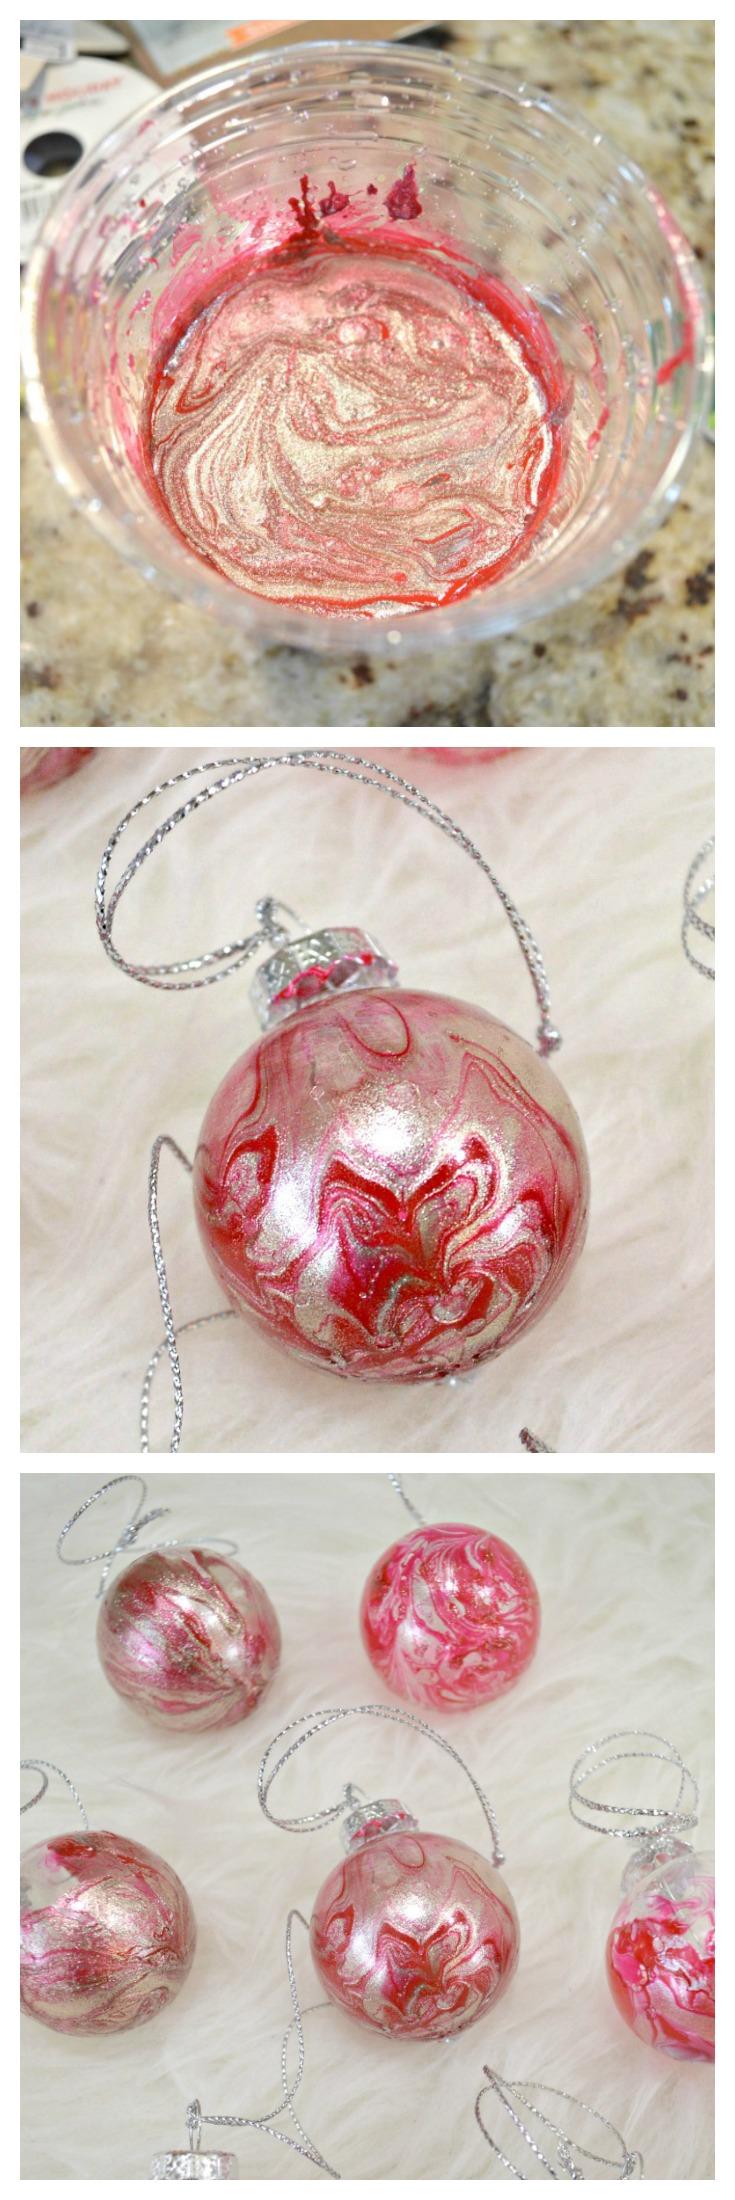 DIY Marbled Christmas Ornaments